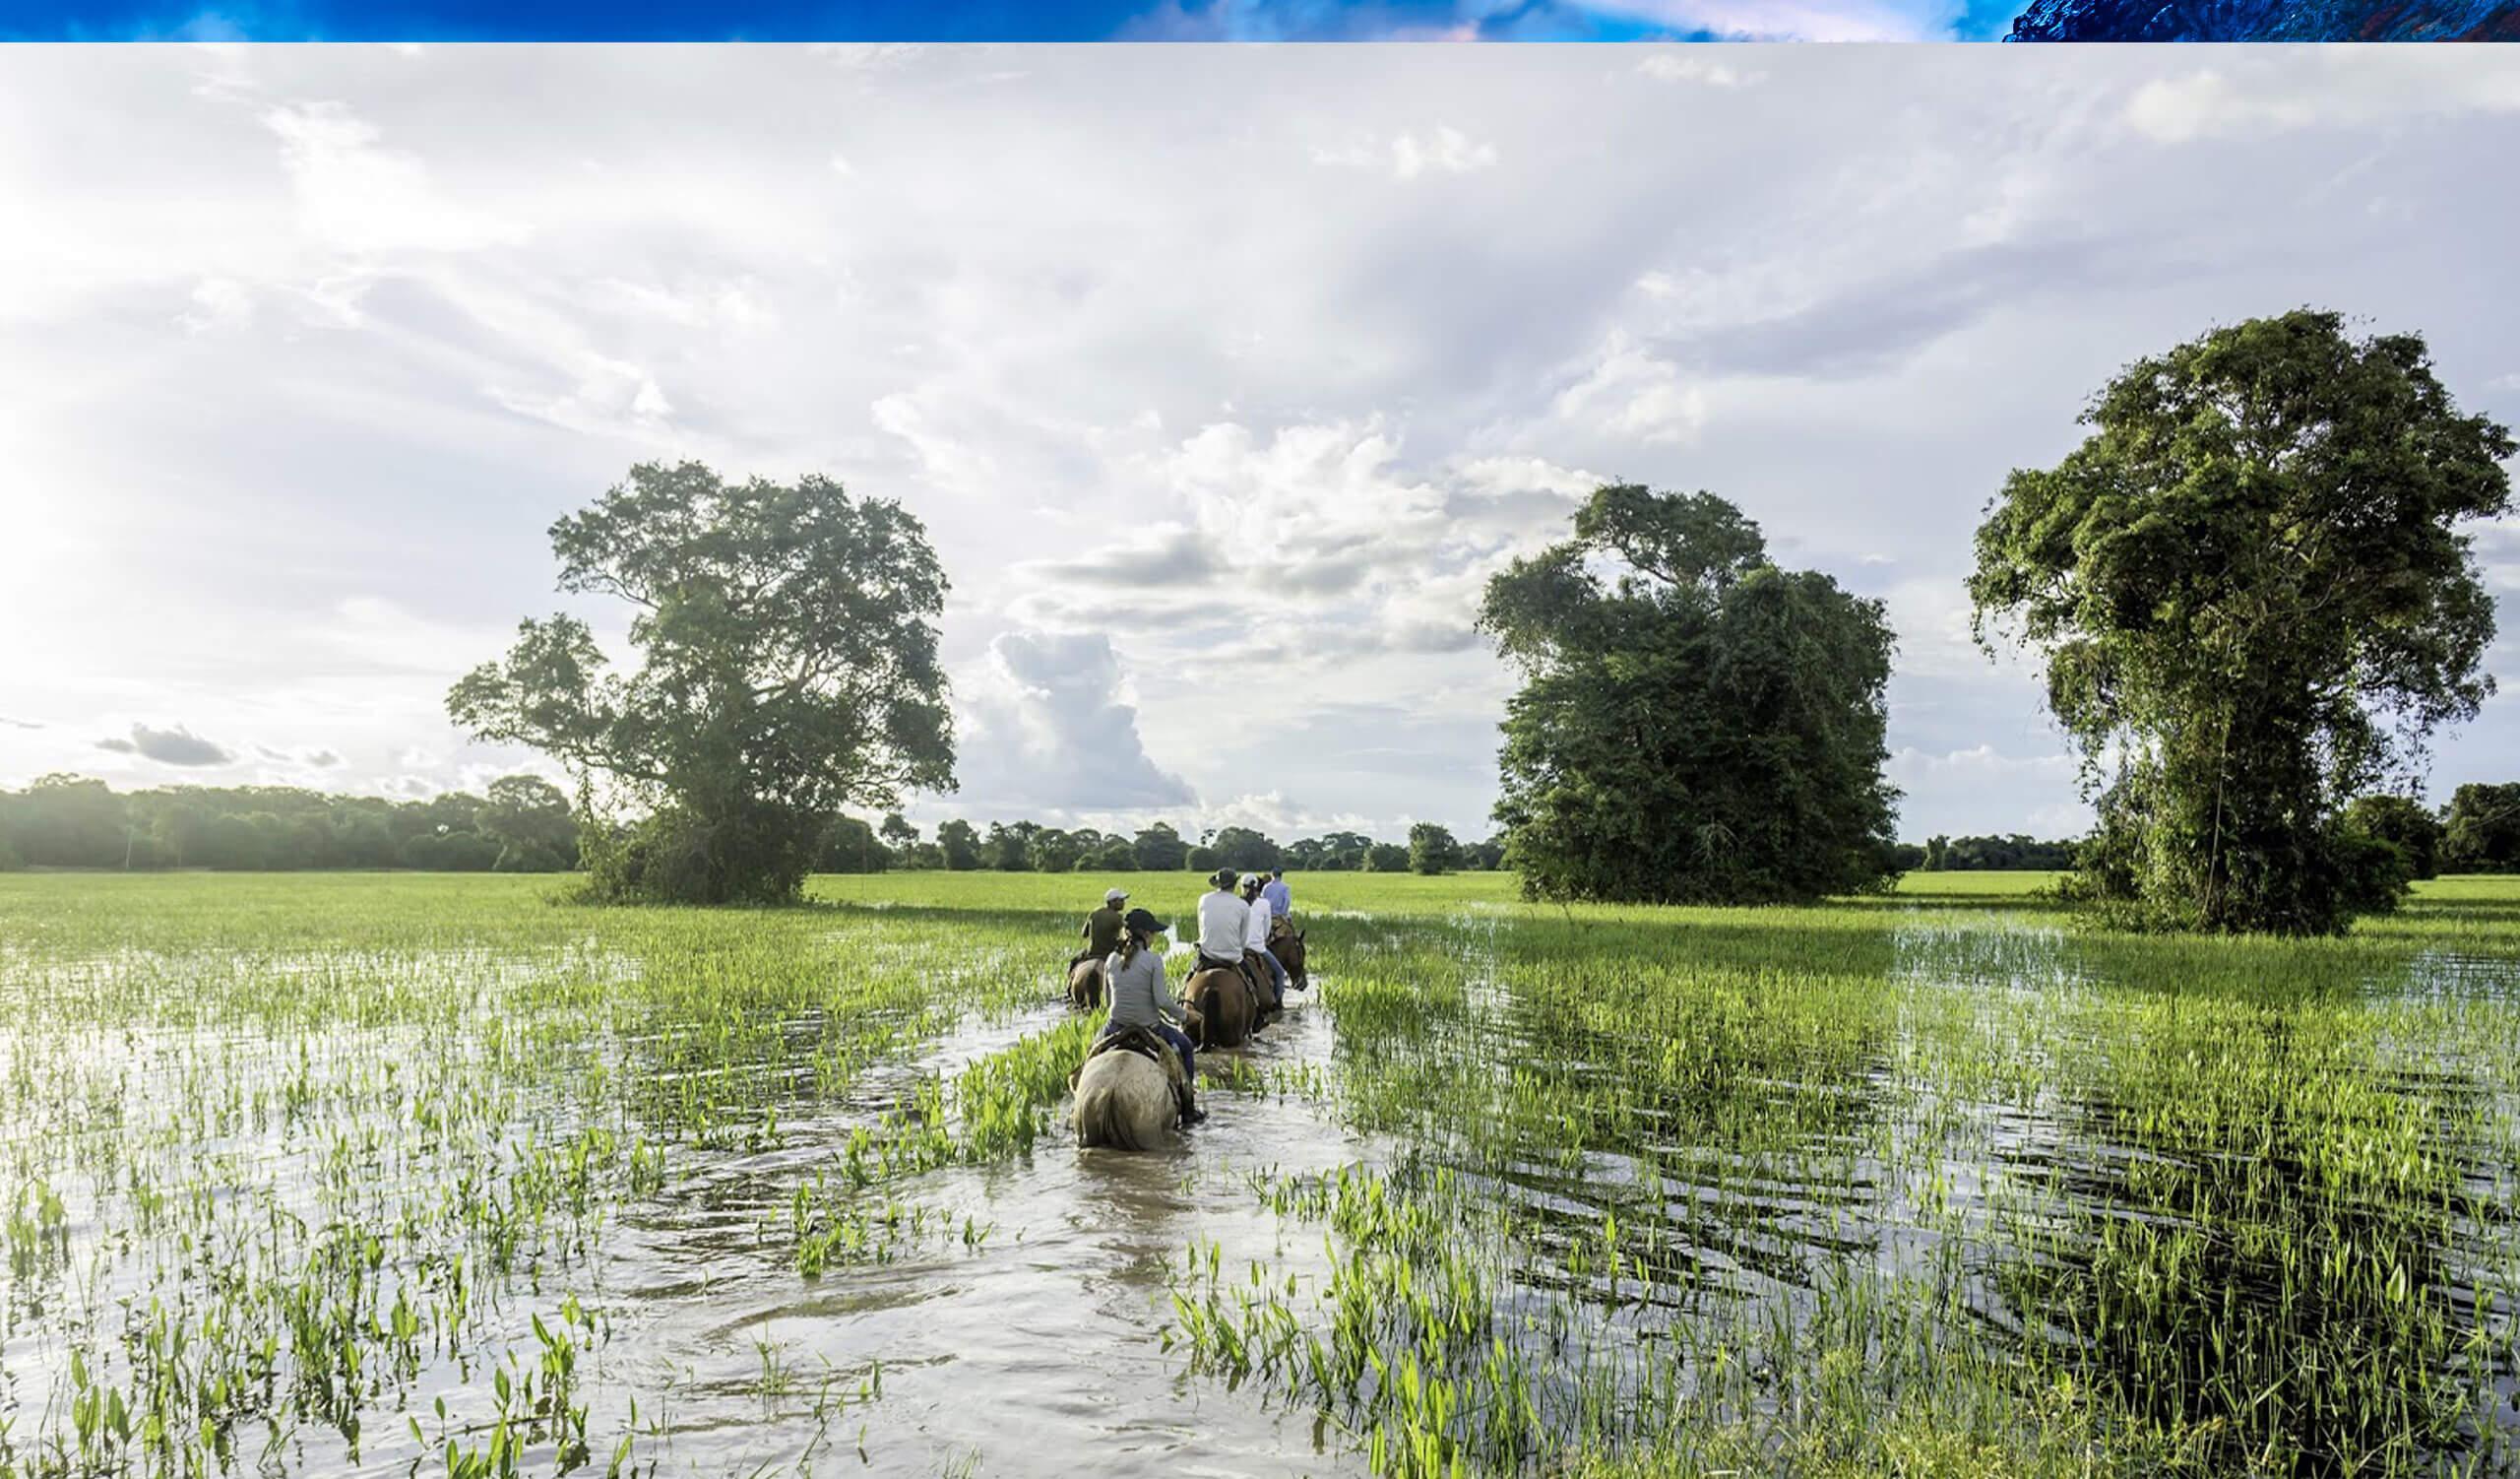 tourists riding horses through wetland